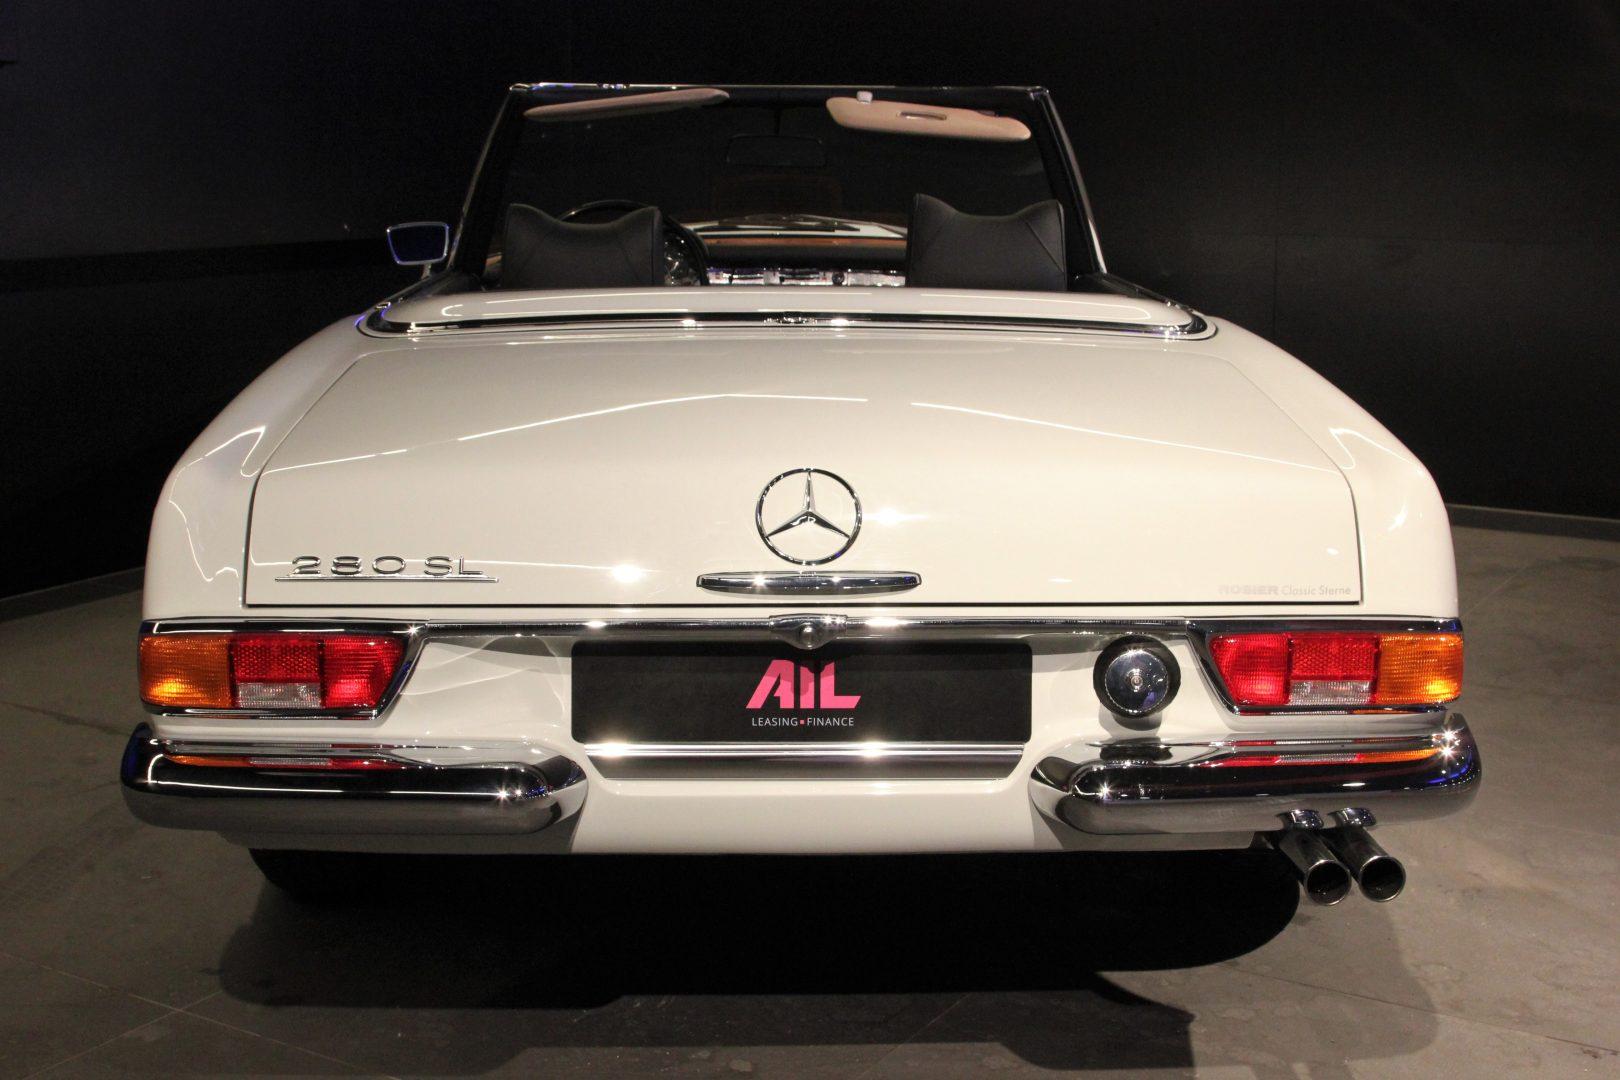 AIL Mercedes-Benz 280 SL Pagode Automatik 4